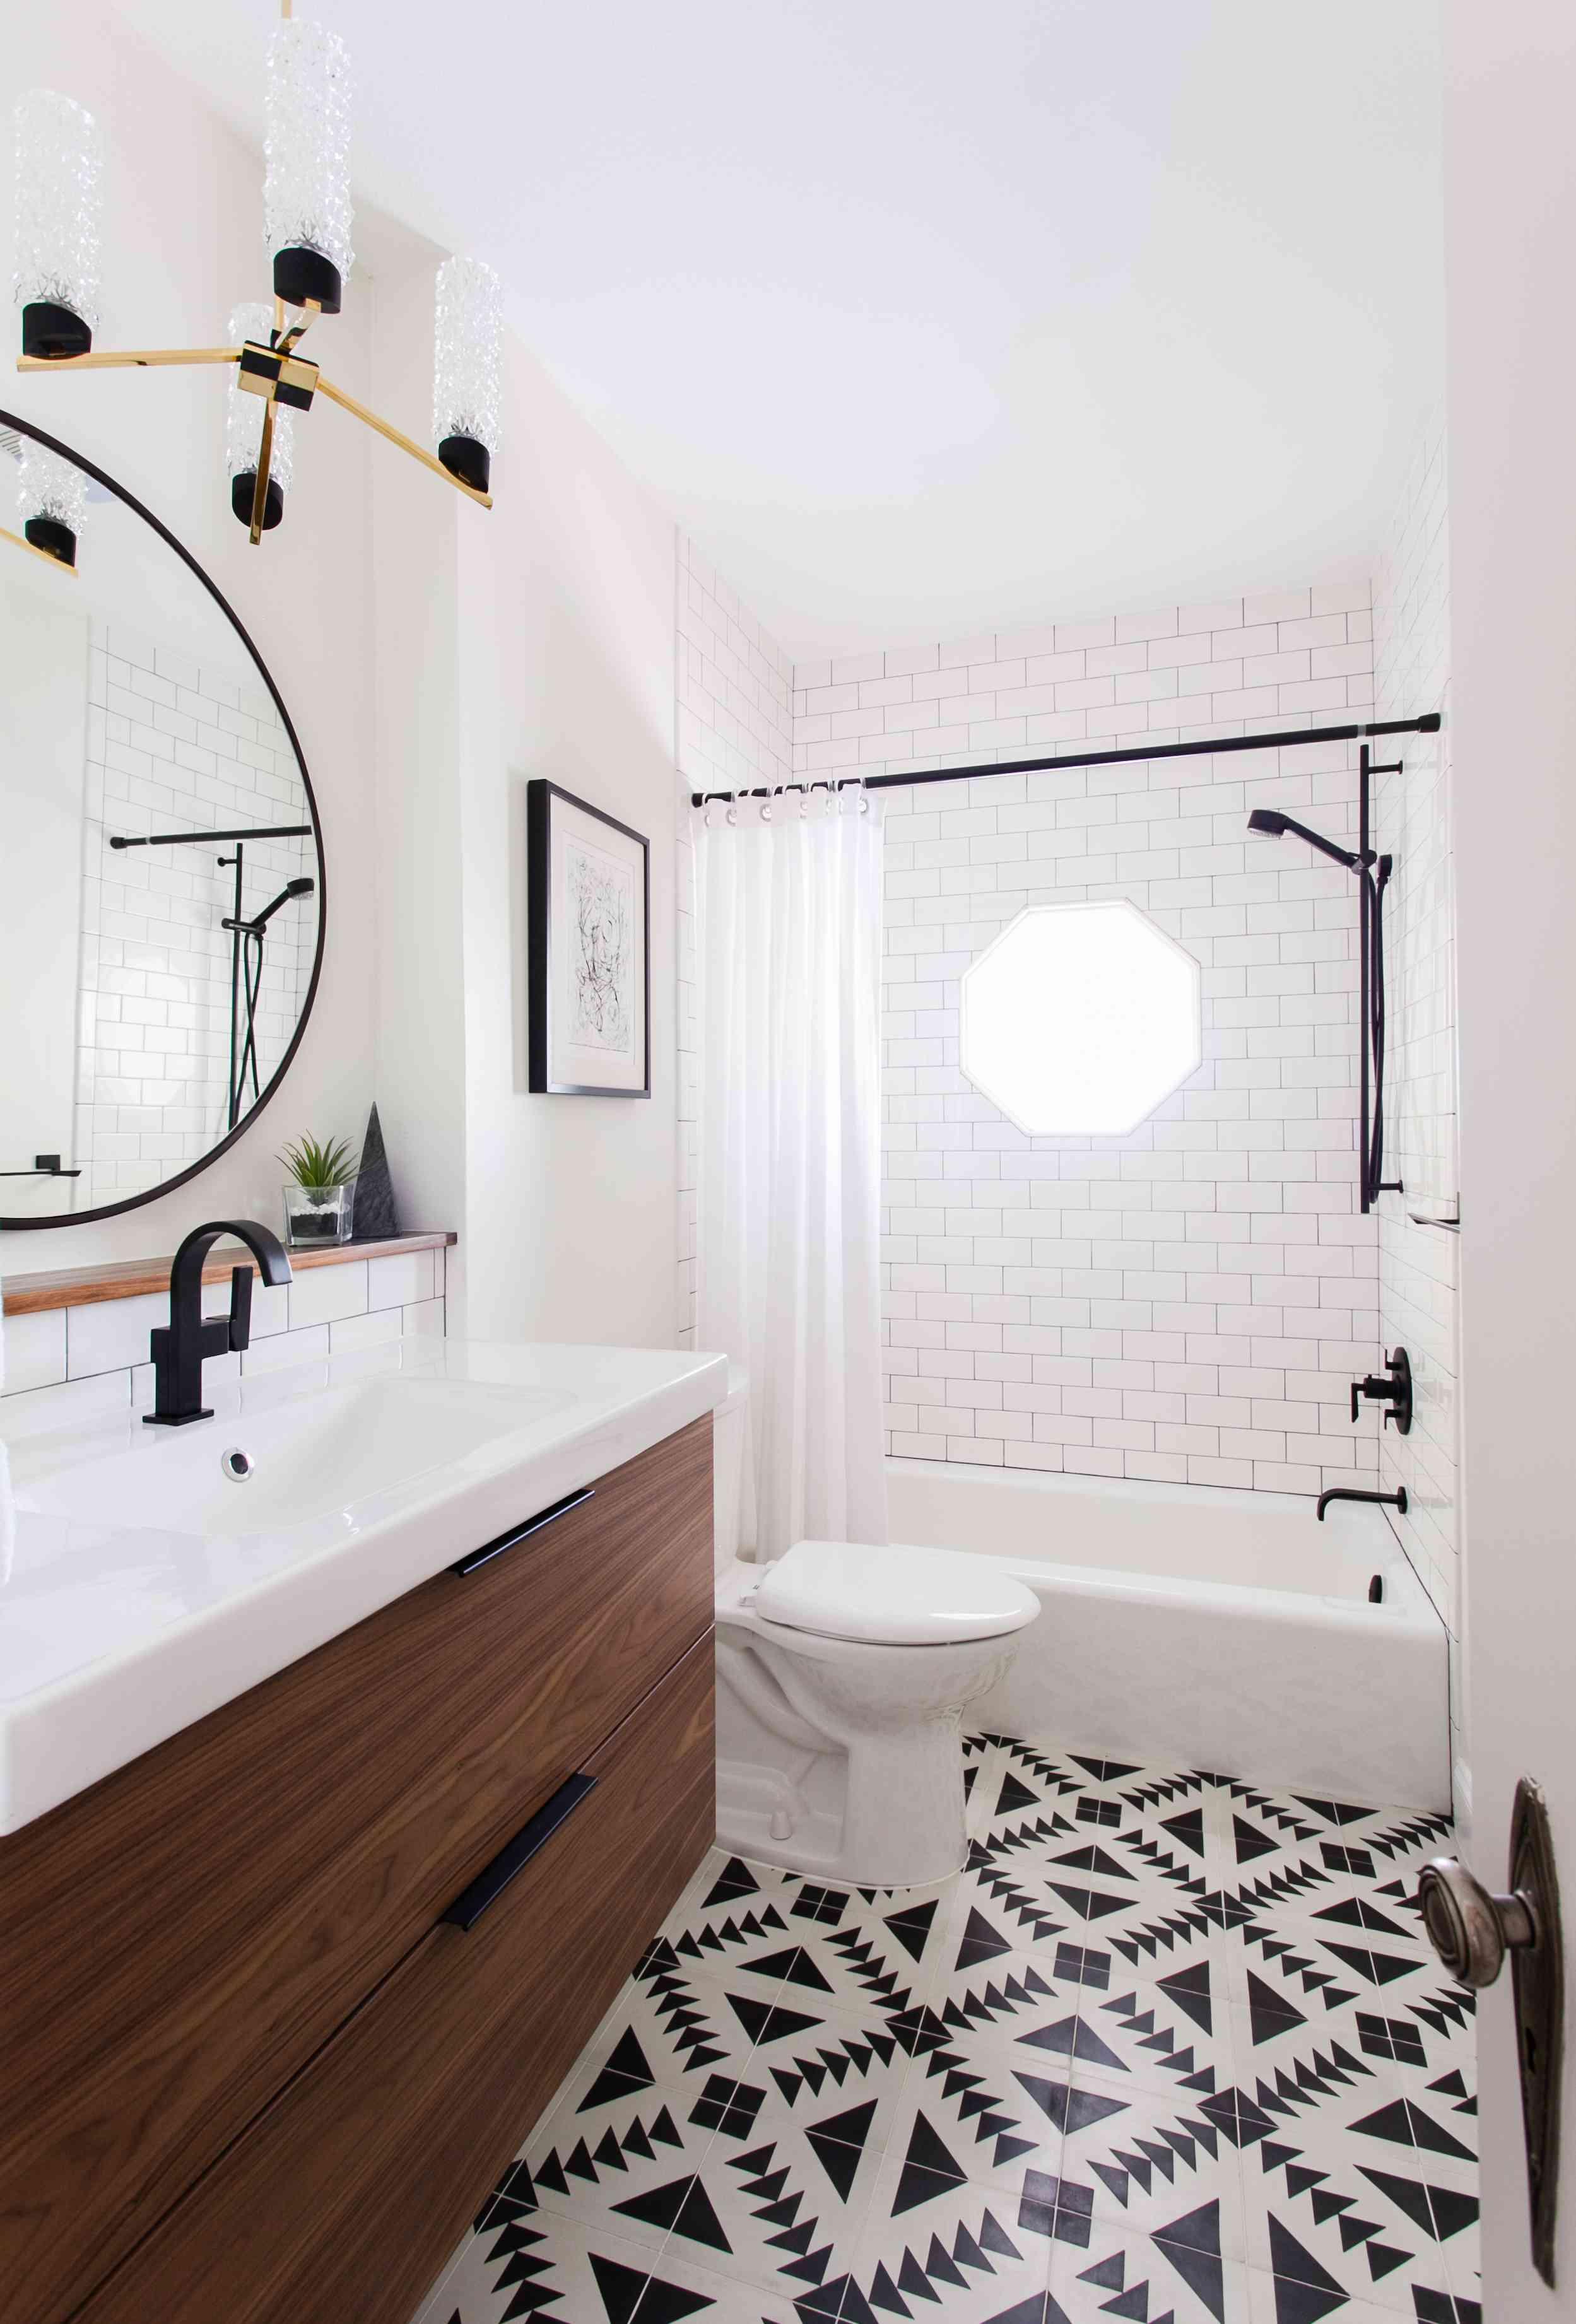 Bathroom by Erin Williamson